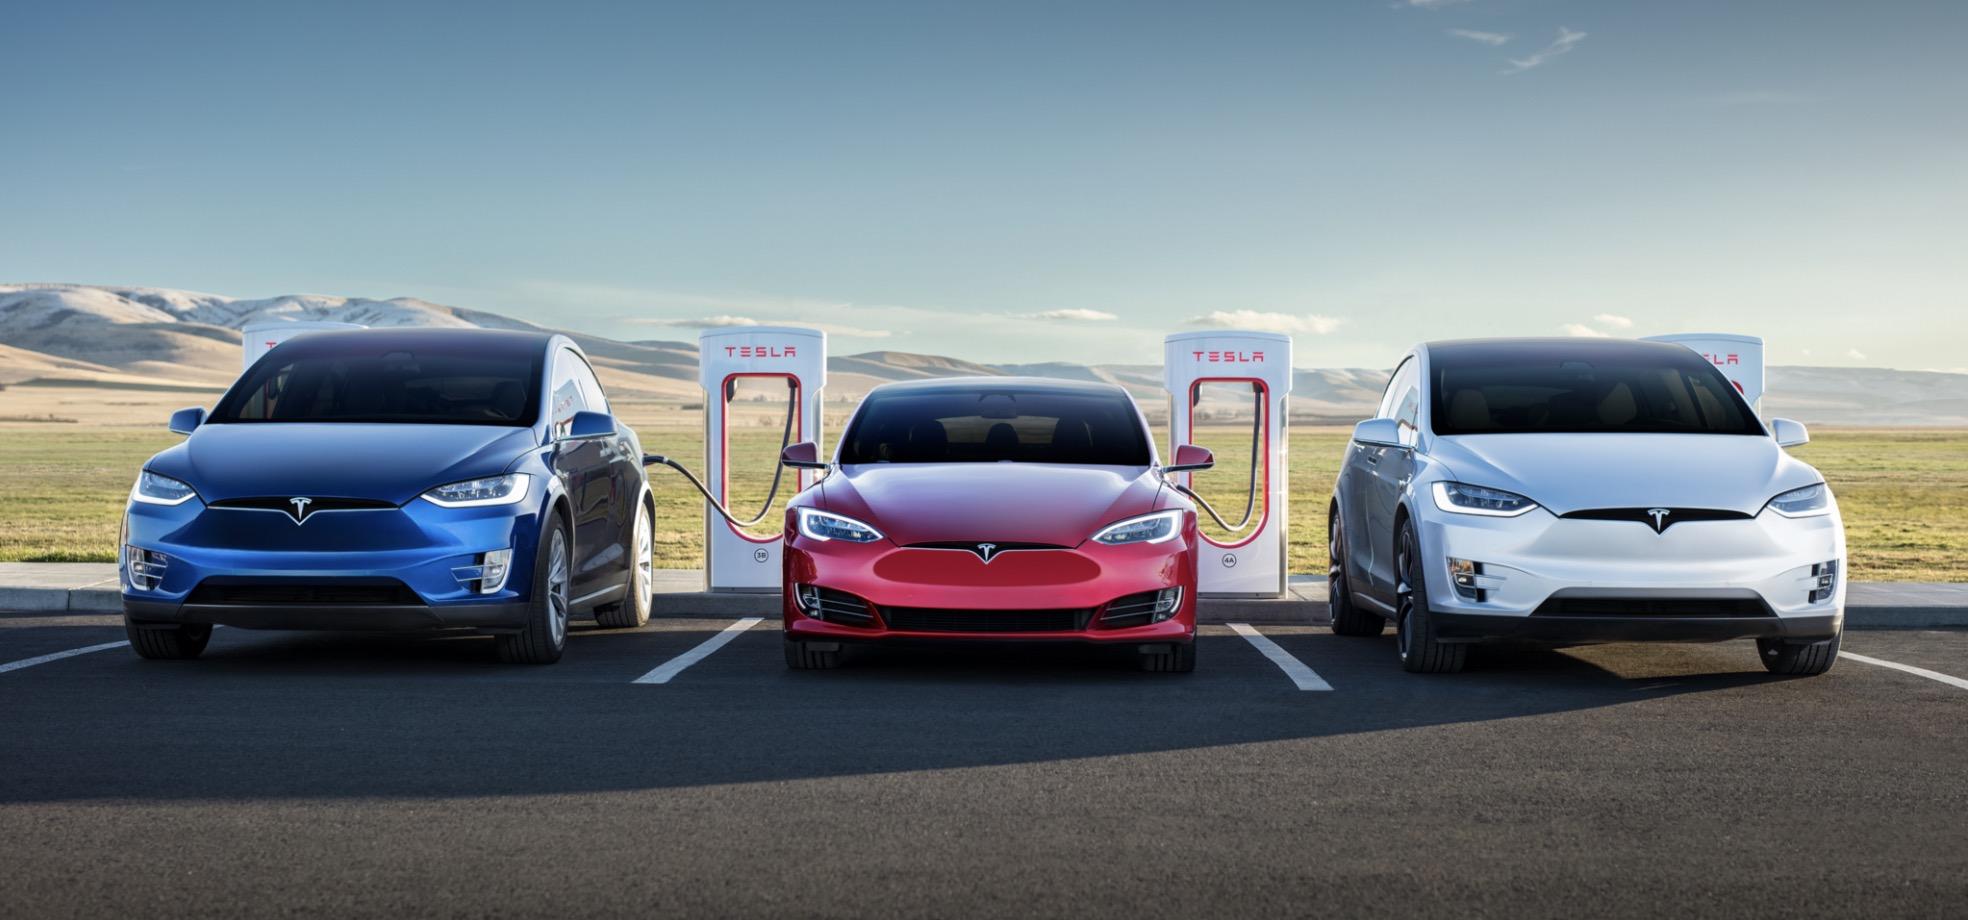 Tesla Confirms Having Produced Its 300000th Electric Car